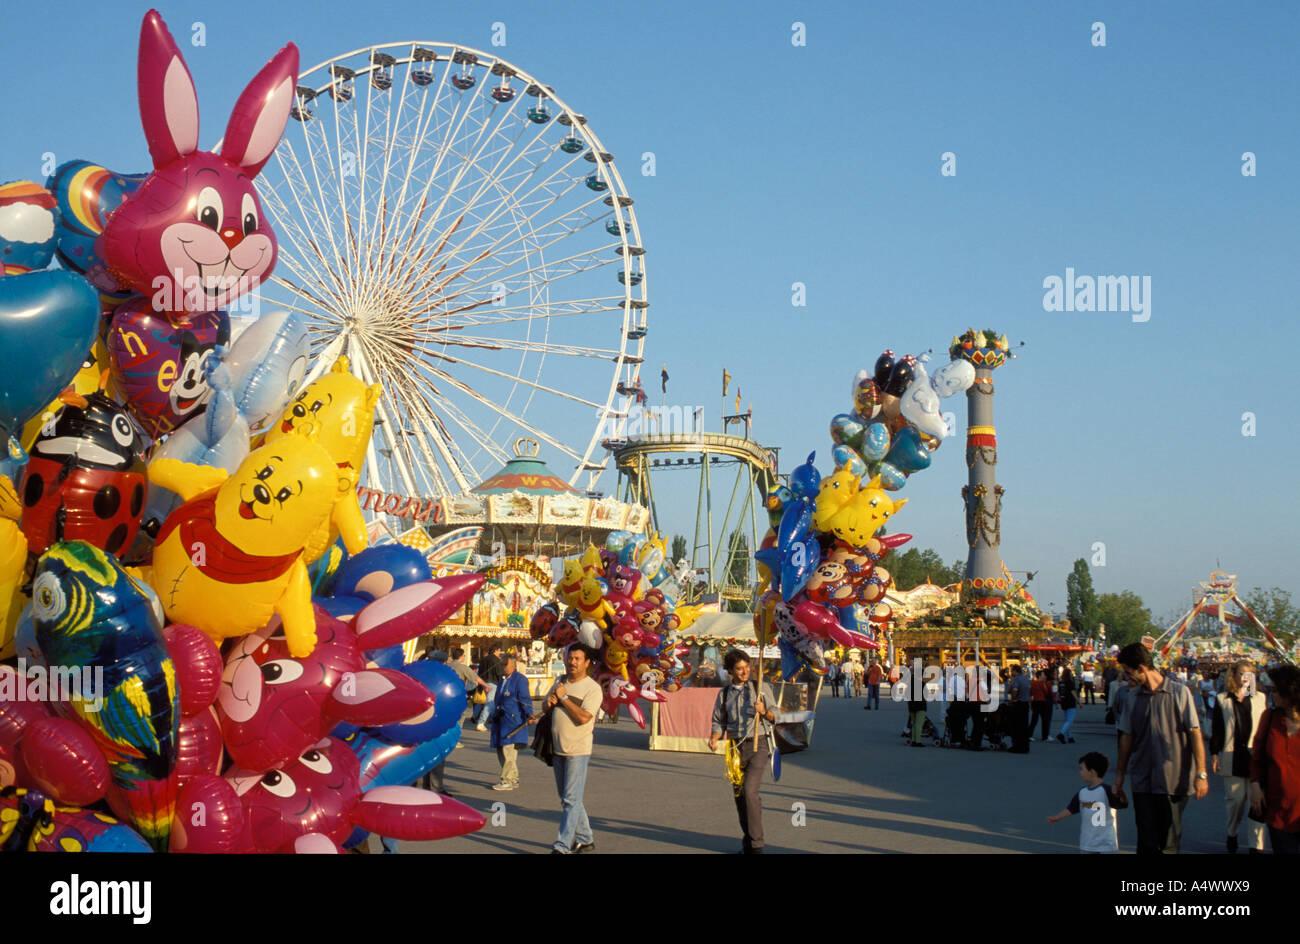 People at the fairground of the festival Cannstatter Volksfest  Stuttgart Baden Wuerttemberg Germany - Stock Image